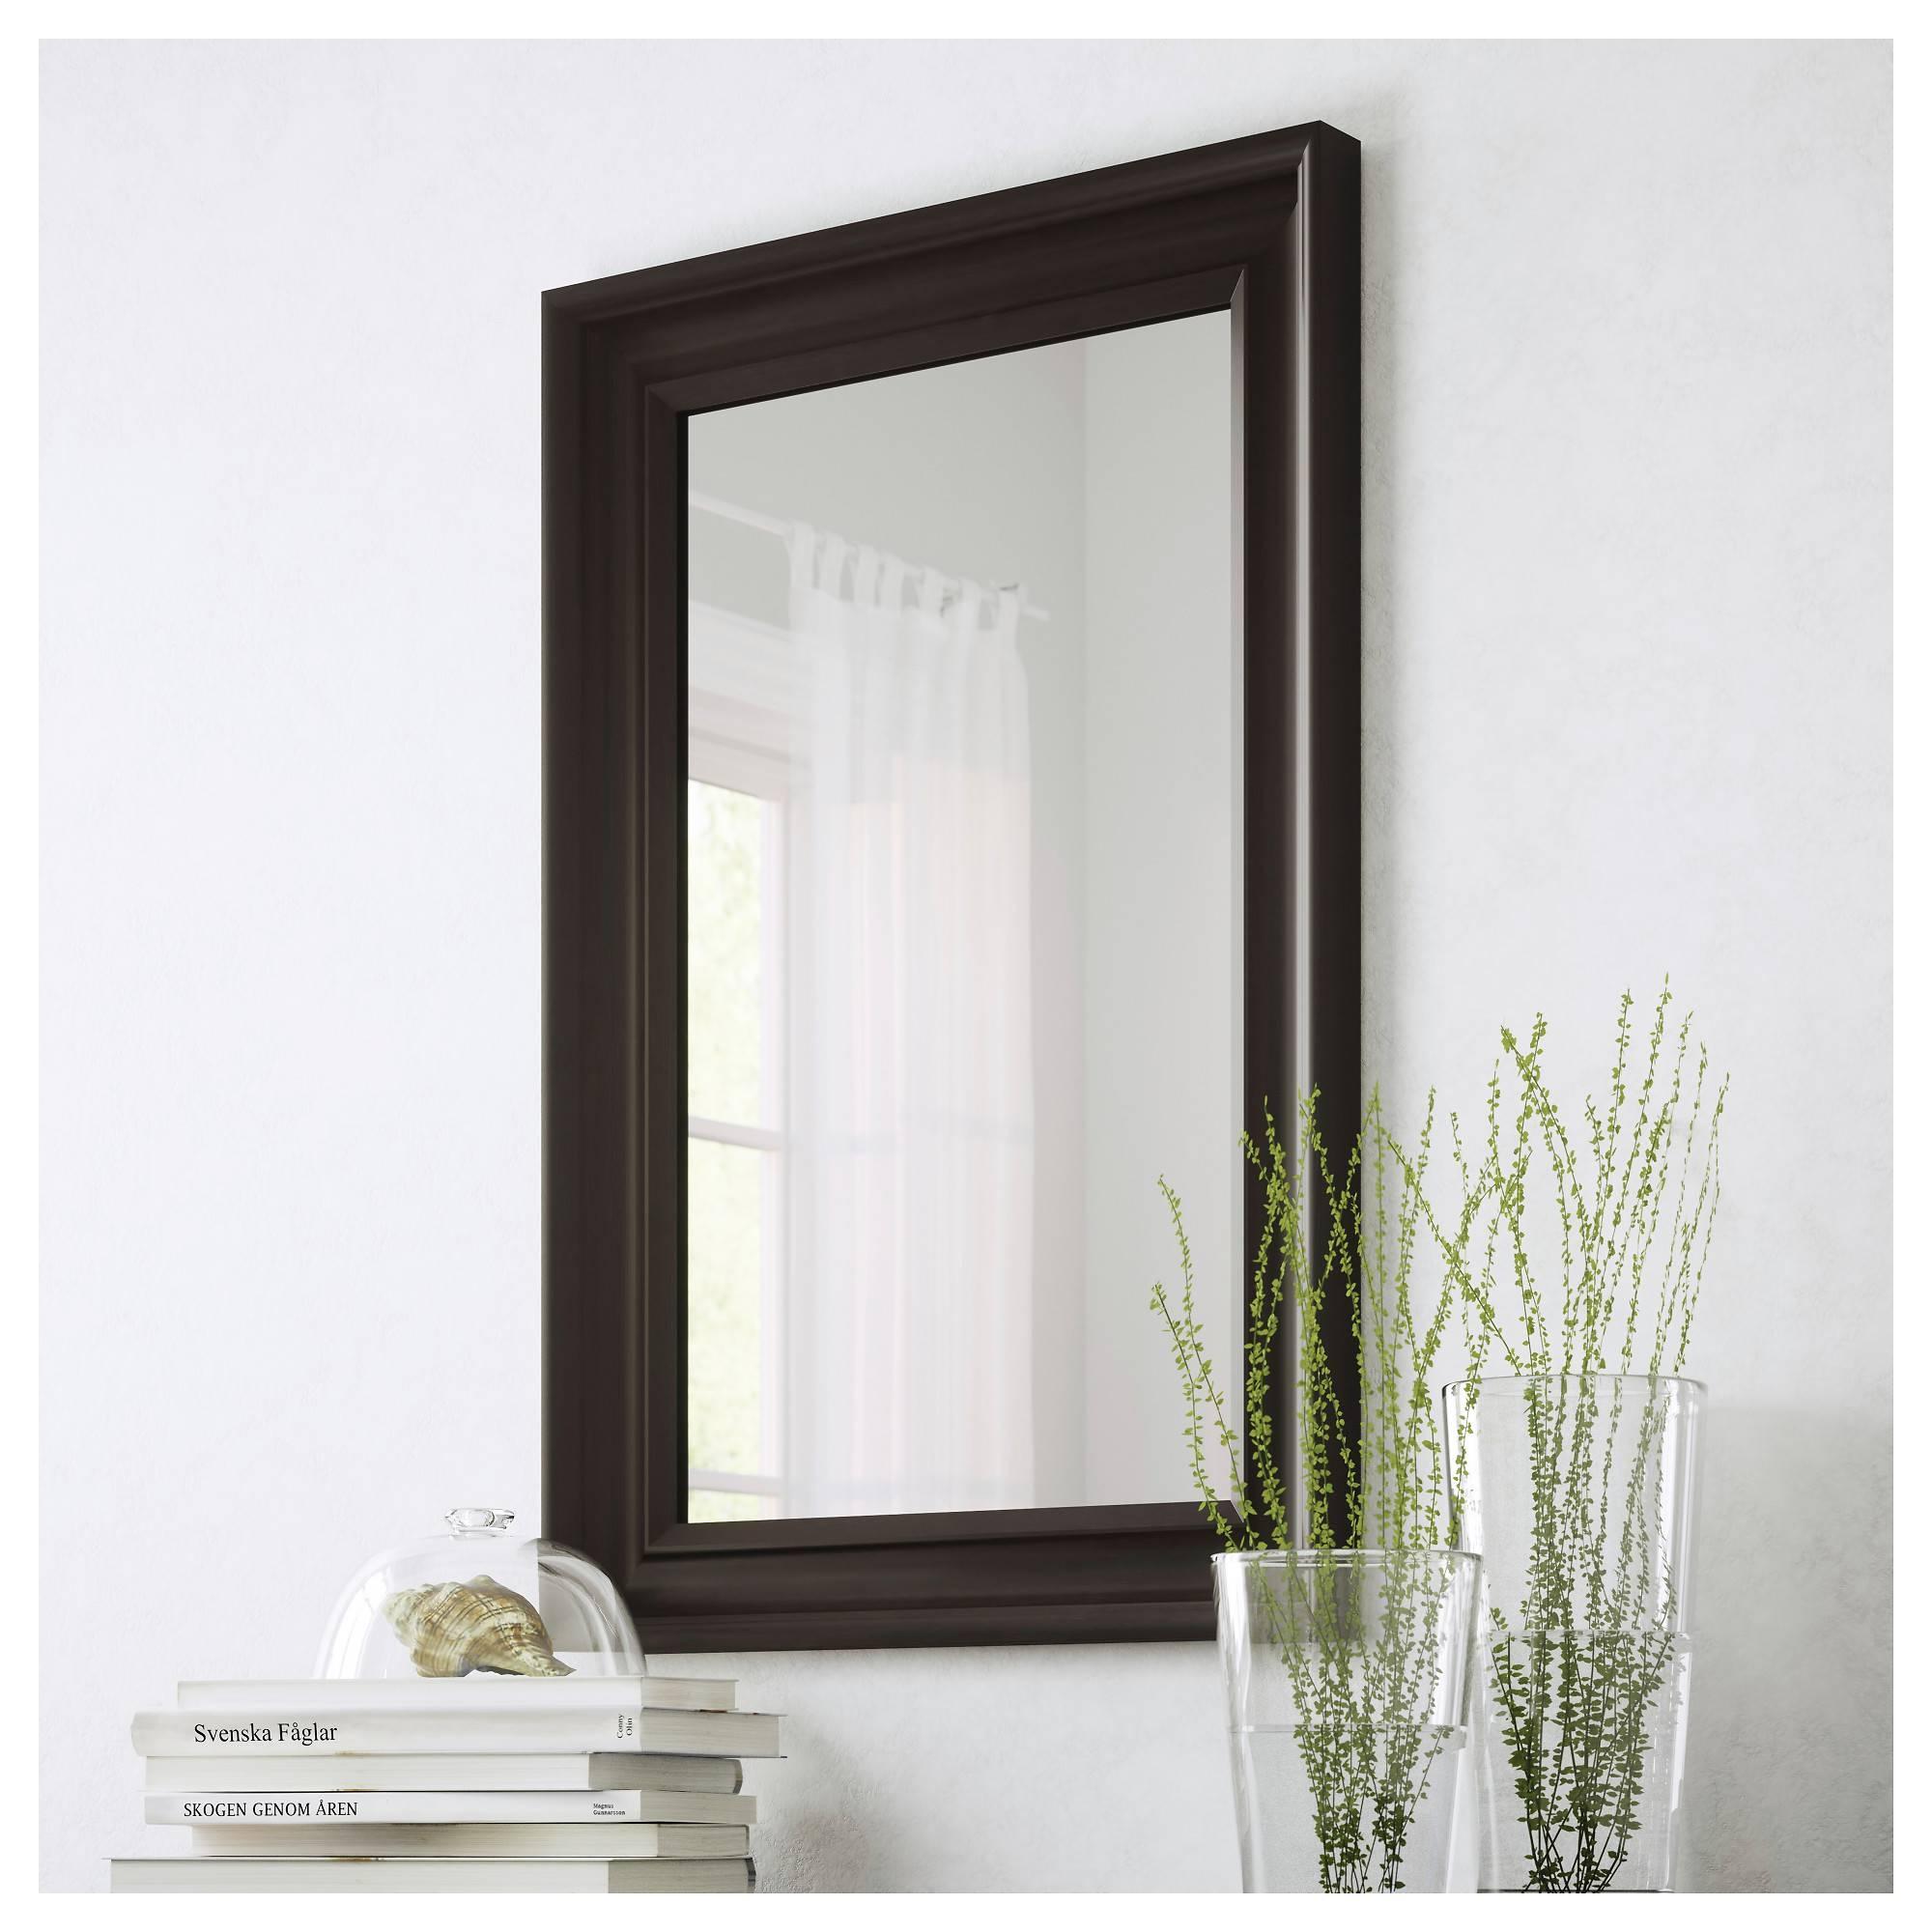 Hemnes Mirror Black Brown 60X90 Cm – Ikea For Long Black Wall Mirrors (View 9 of 15)